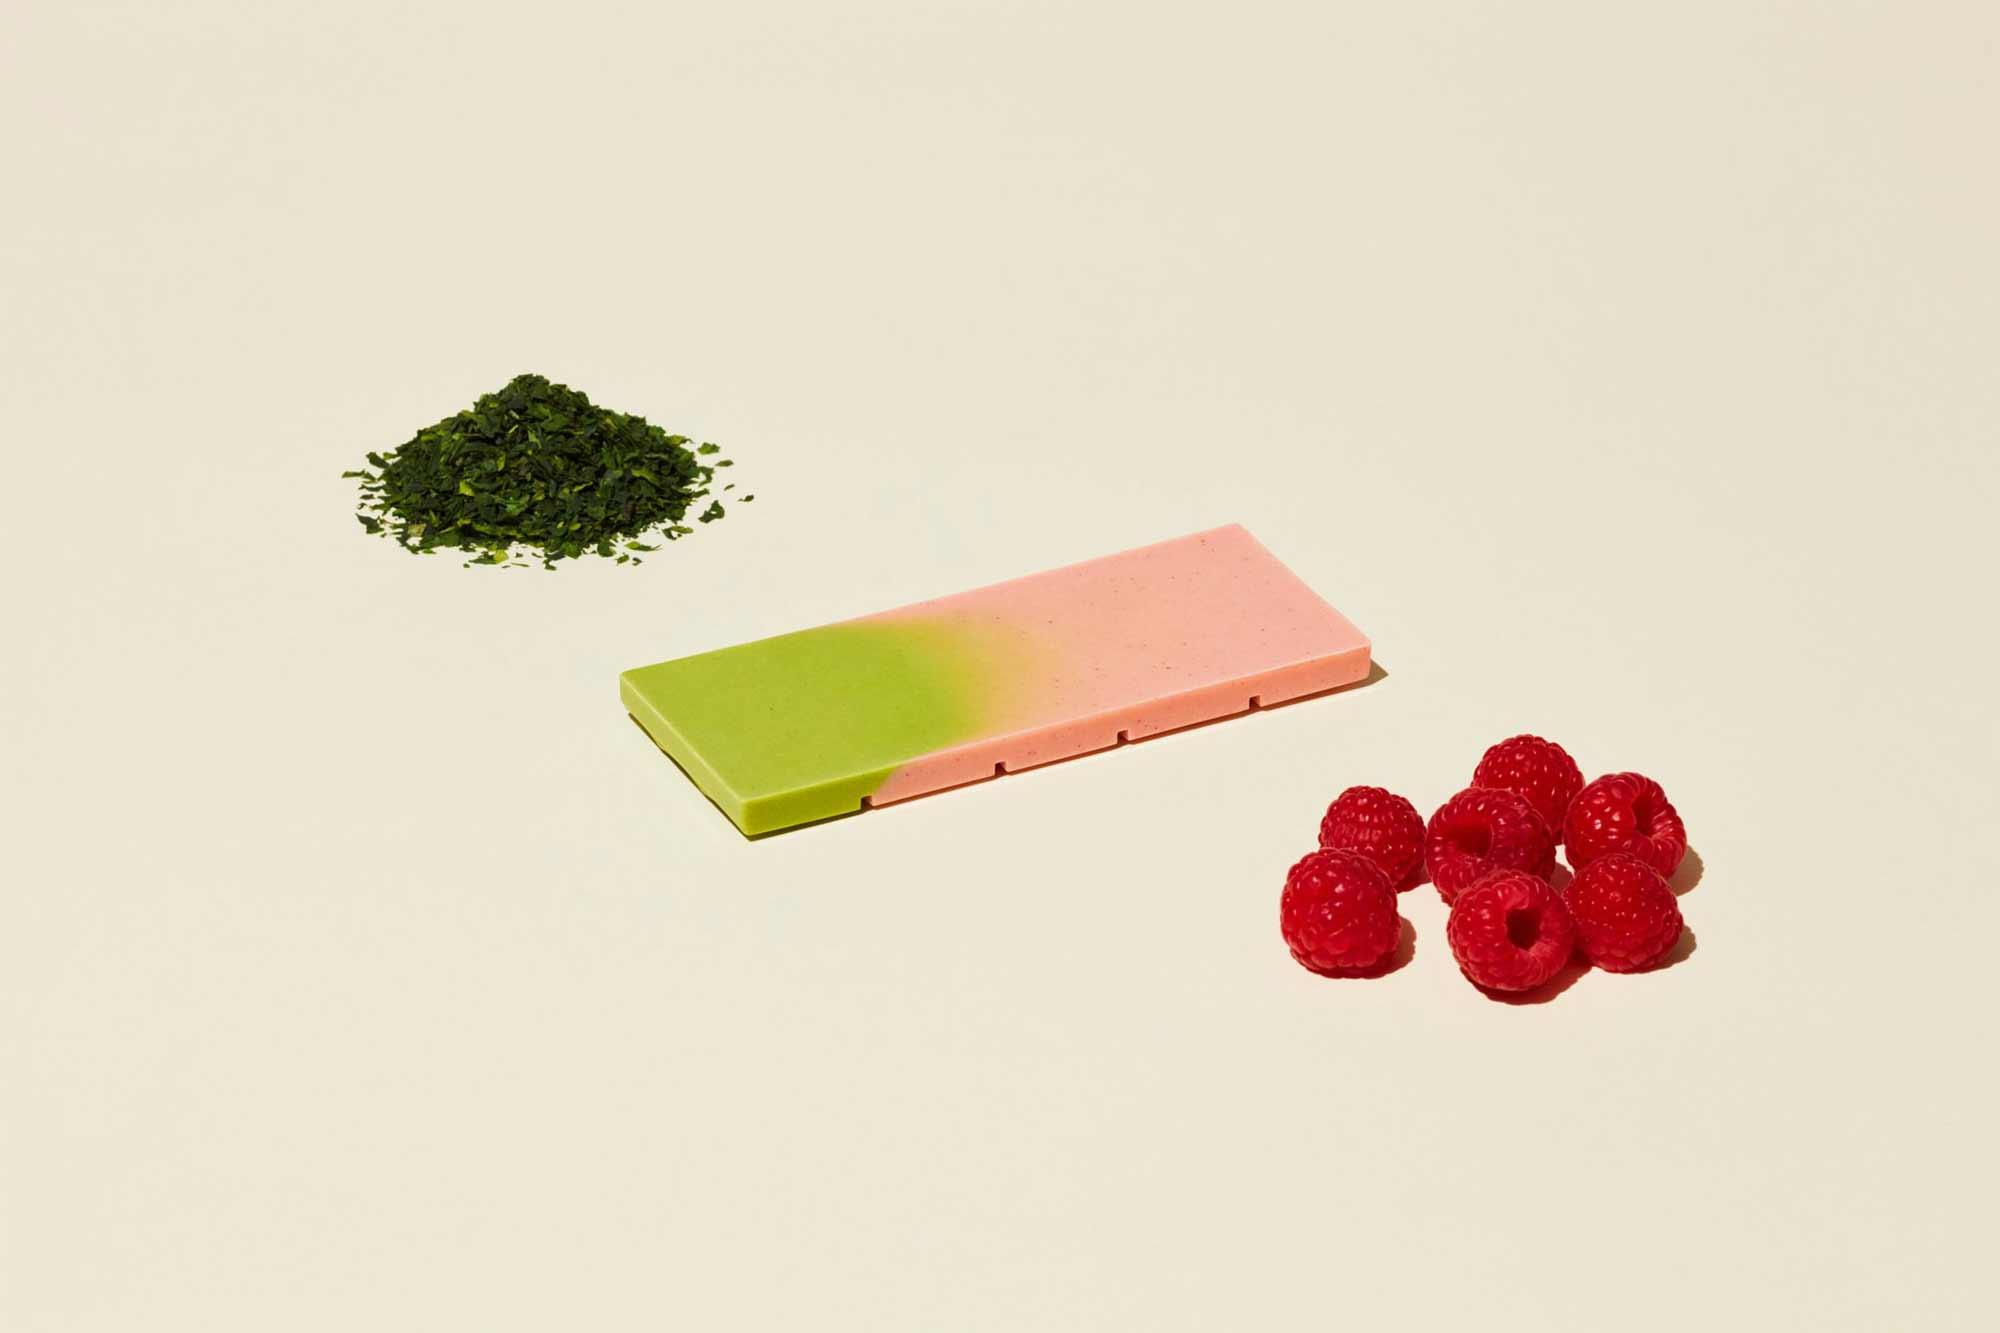 Farbverlauf-Schokolade Farbverlauf-Schokolade-Little-Motherhouse_03